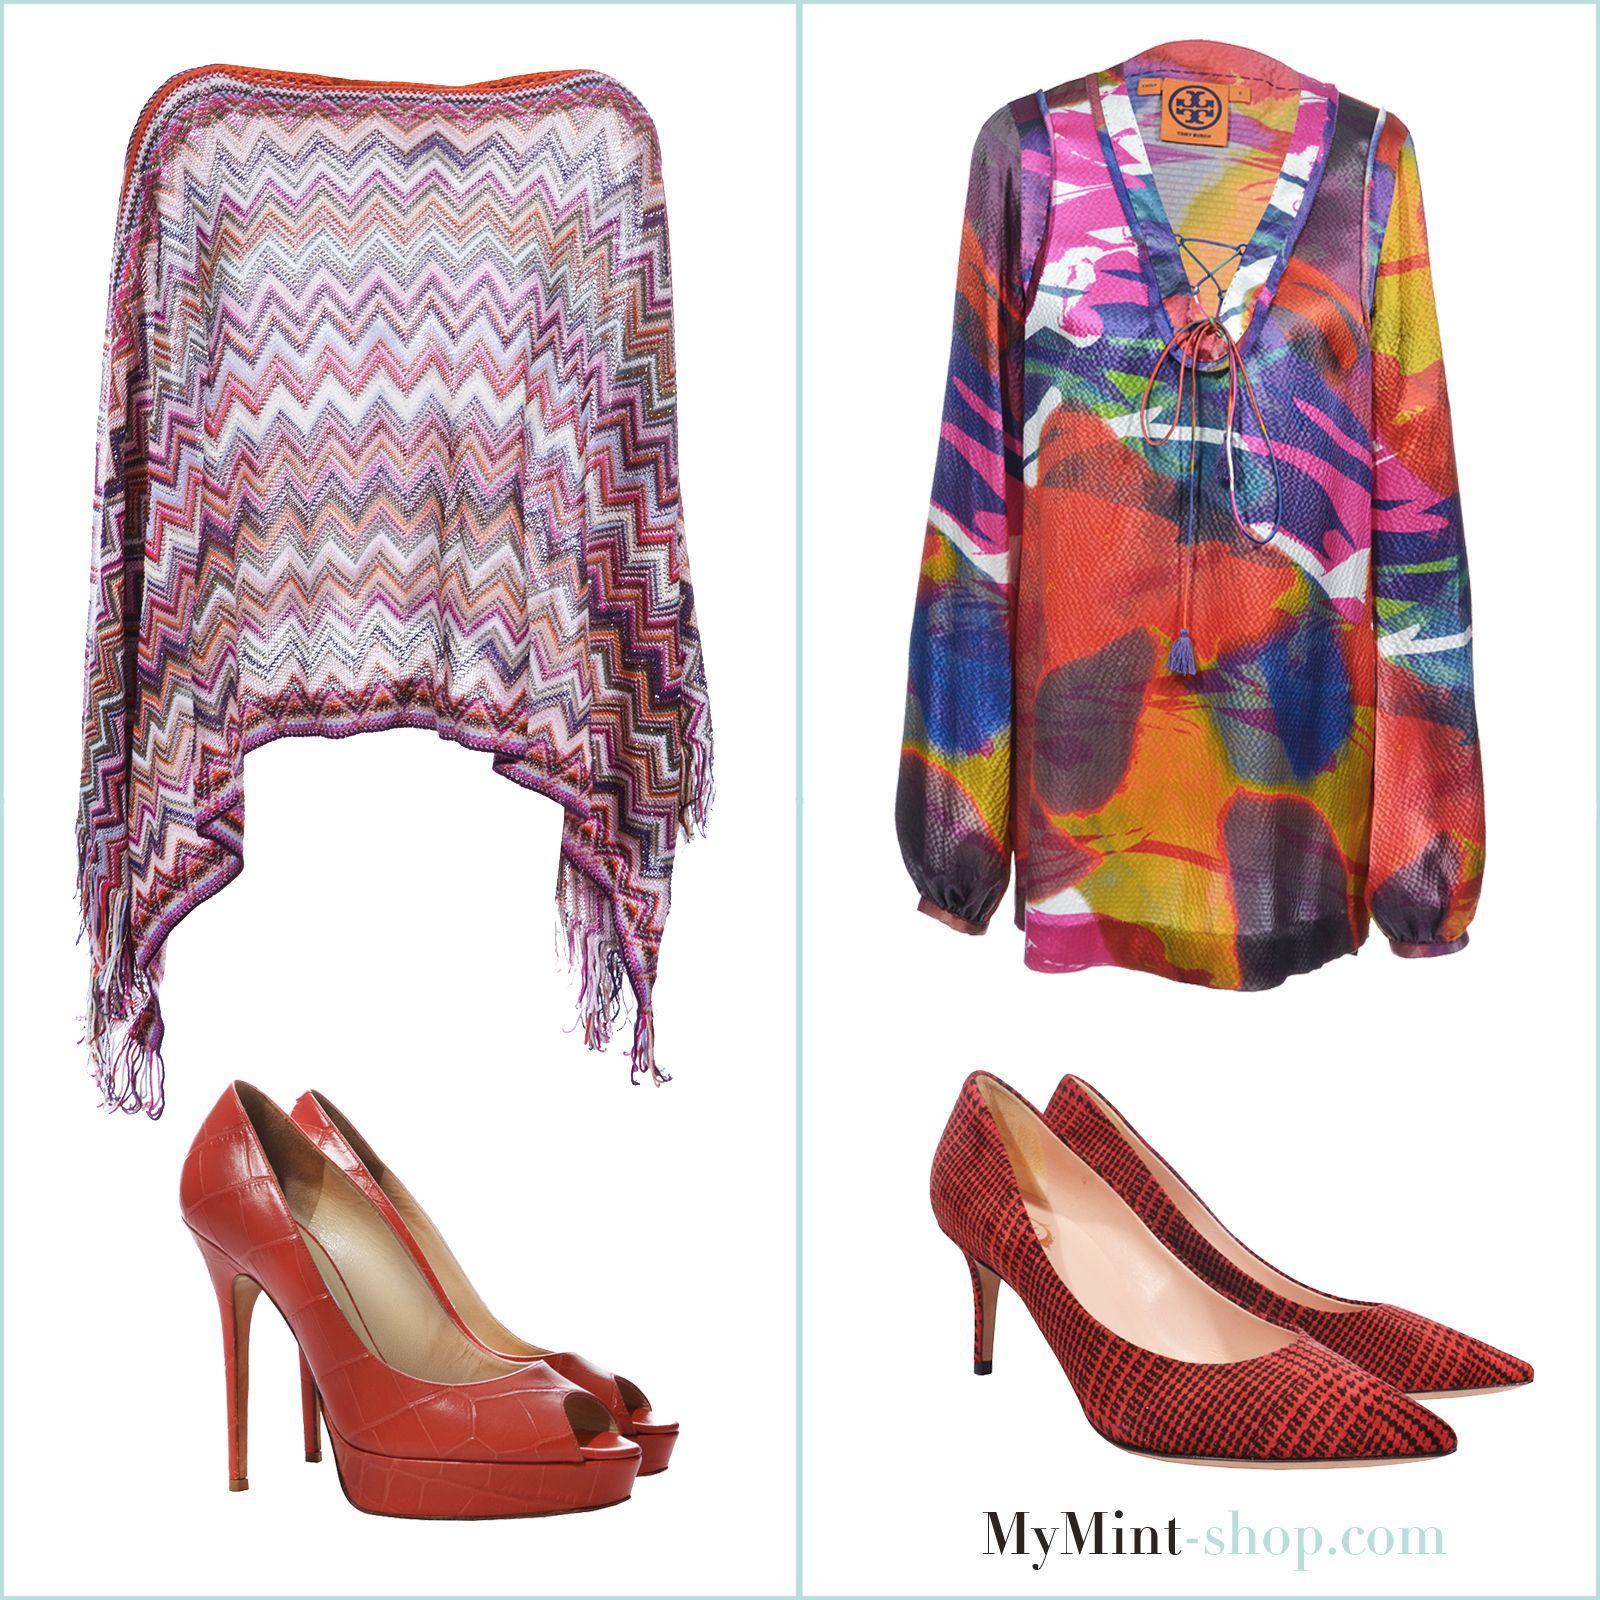 TUESDAY´S NEW ARRIVALS! #JimmyChoo   #Unützer   #ToryBurch   #Missoni   #Vintage   #Fashion   #MyMint